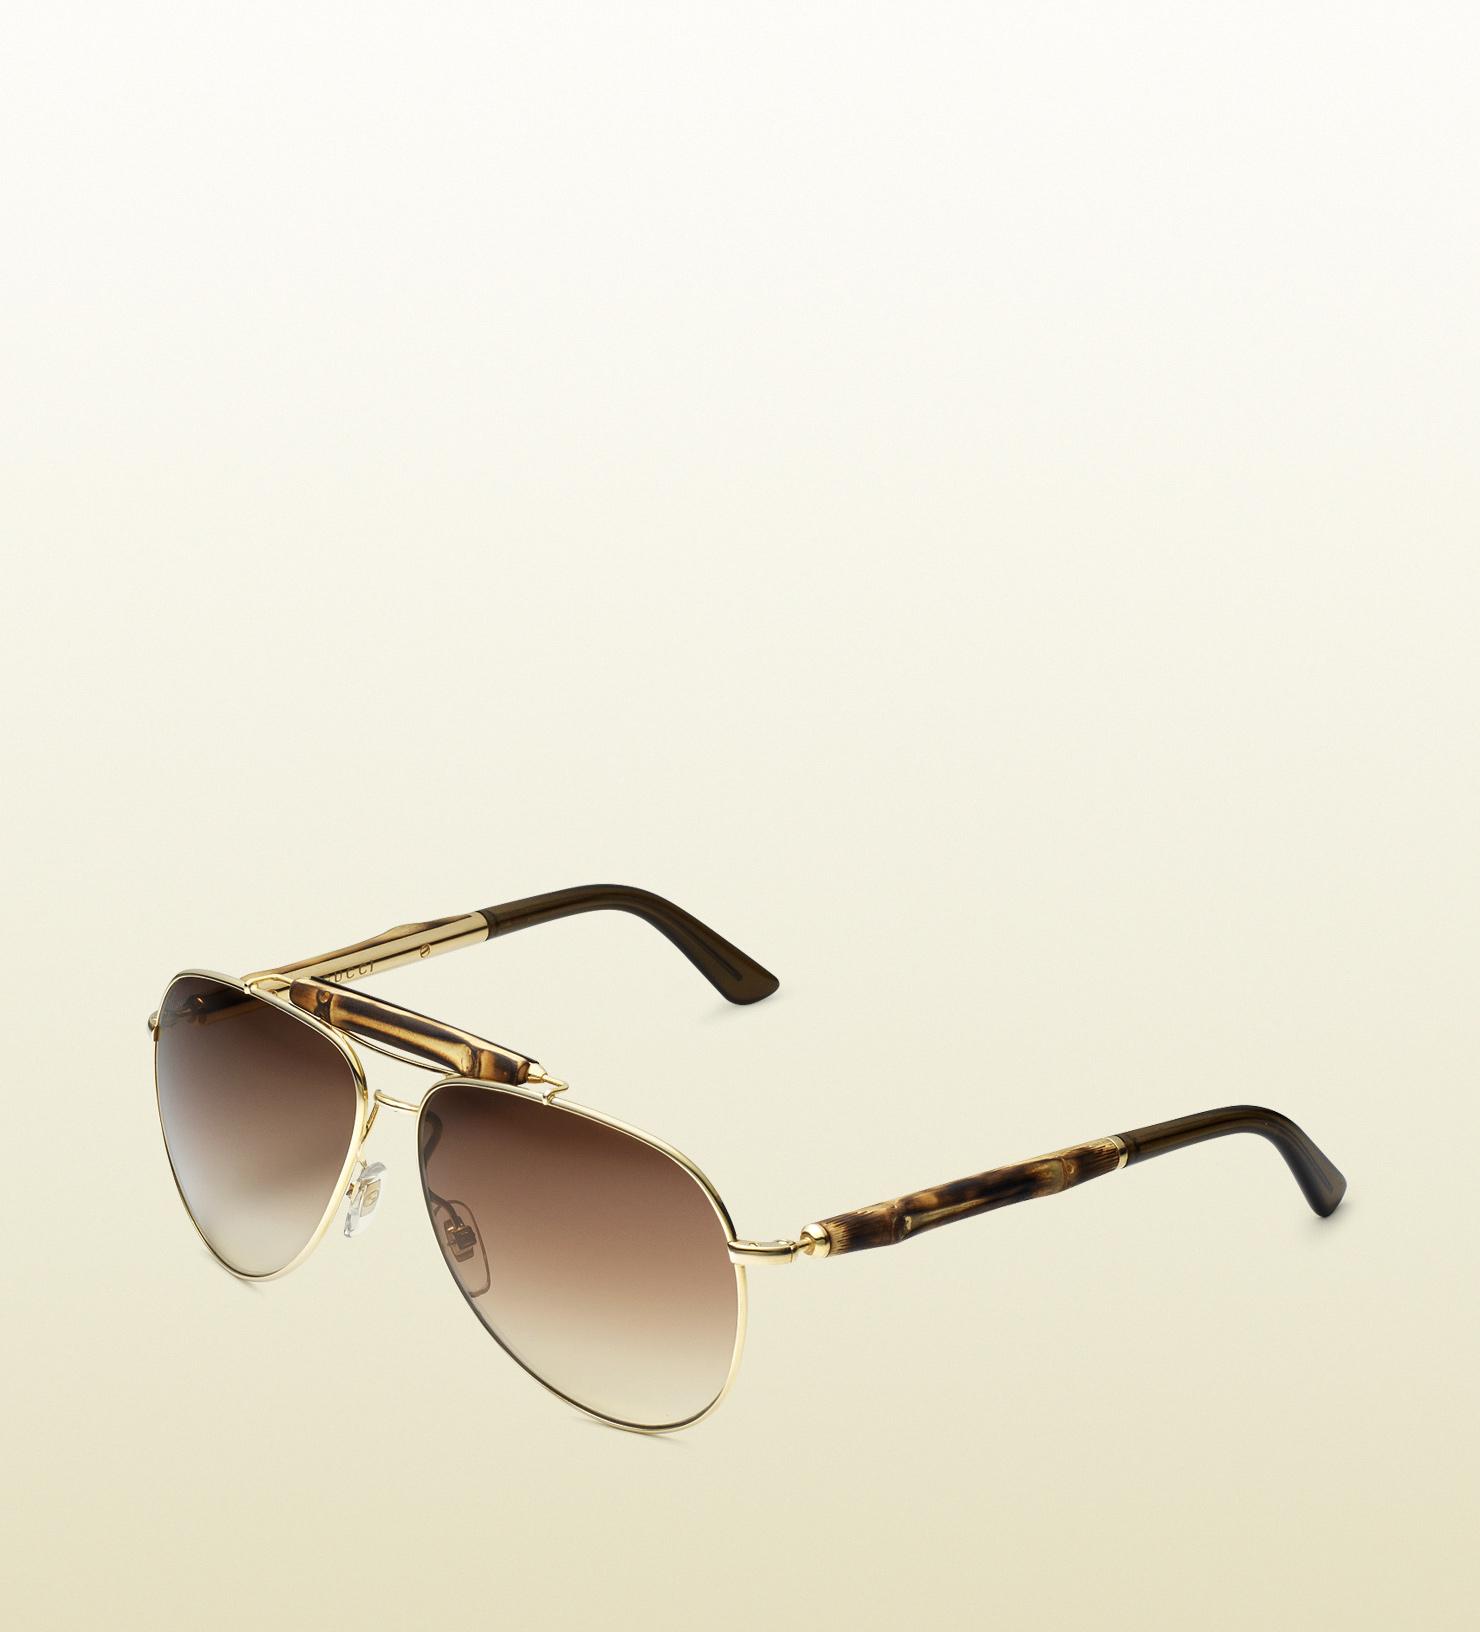 eade9ca6143 Lyst - Gucci Bamboo Aviator Sunglasses in Brown